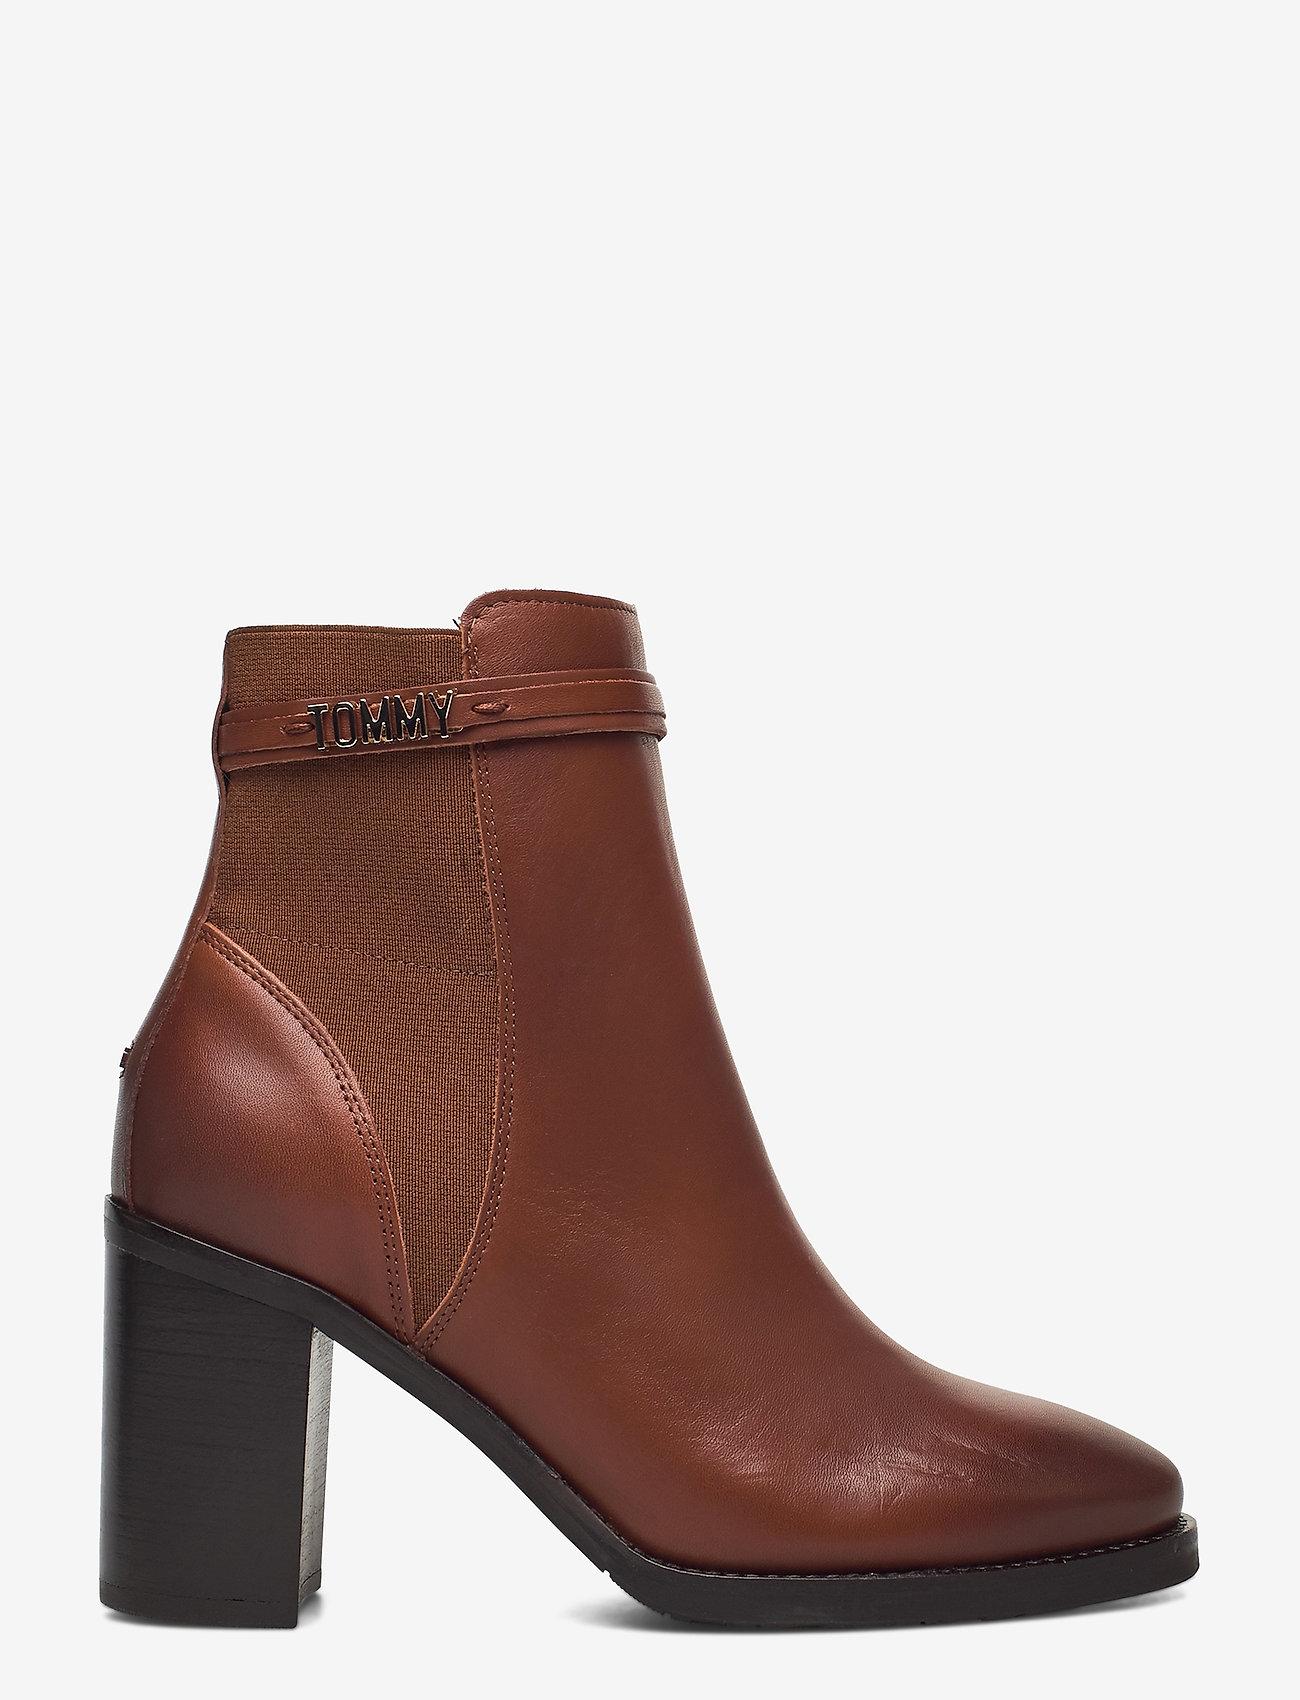 Tommy Hilfiger - BLOCK BRANDING HIGH HEEL BOOT - heeled ankle boots - pumpkin paradise - 1